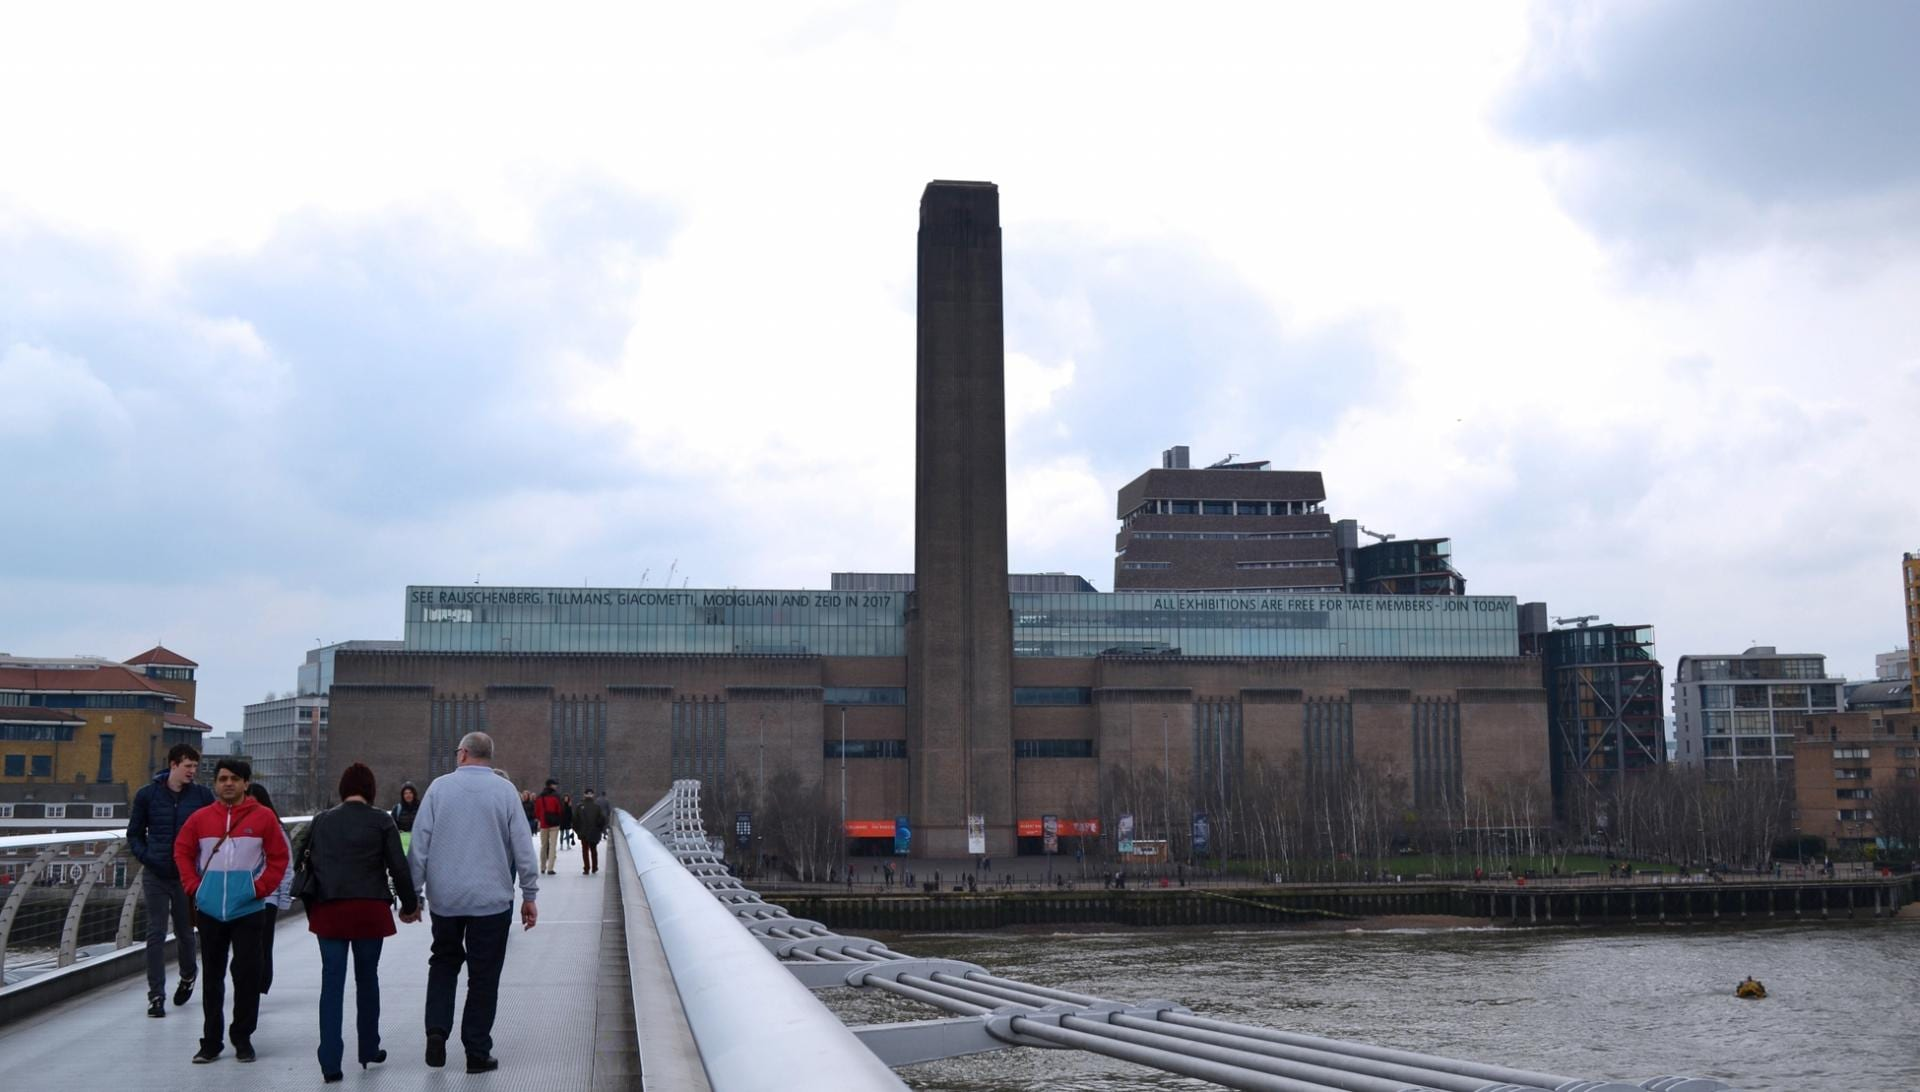 El museo Tate Modern de Londres